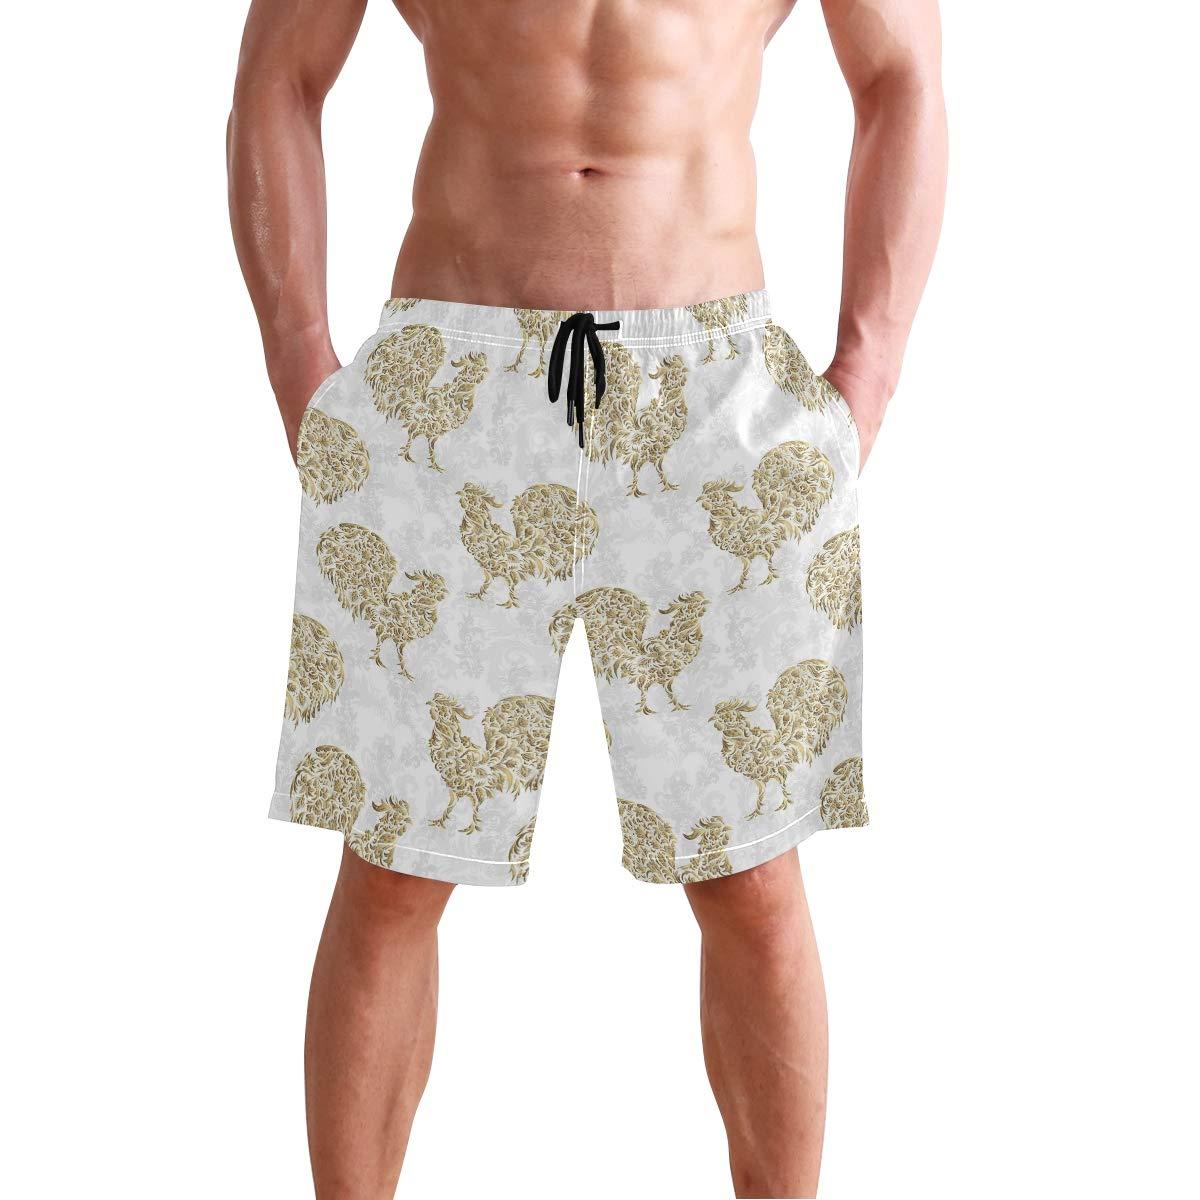 3342297128 Amazon.com: Fuiyi Miyi Men's Swim Trunks Gold Yard Rooster Decor Quick Dry Board  Shorts: Clothing